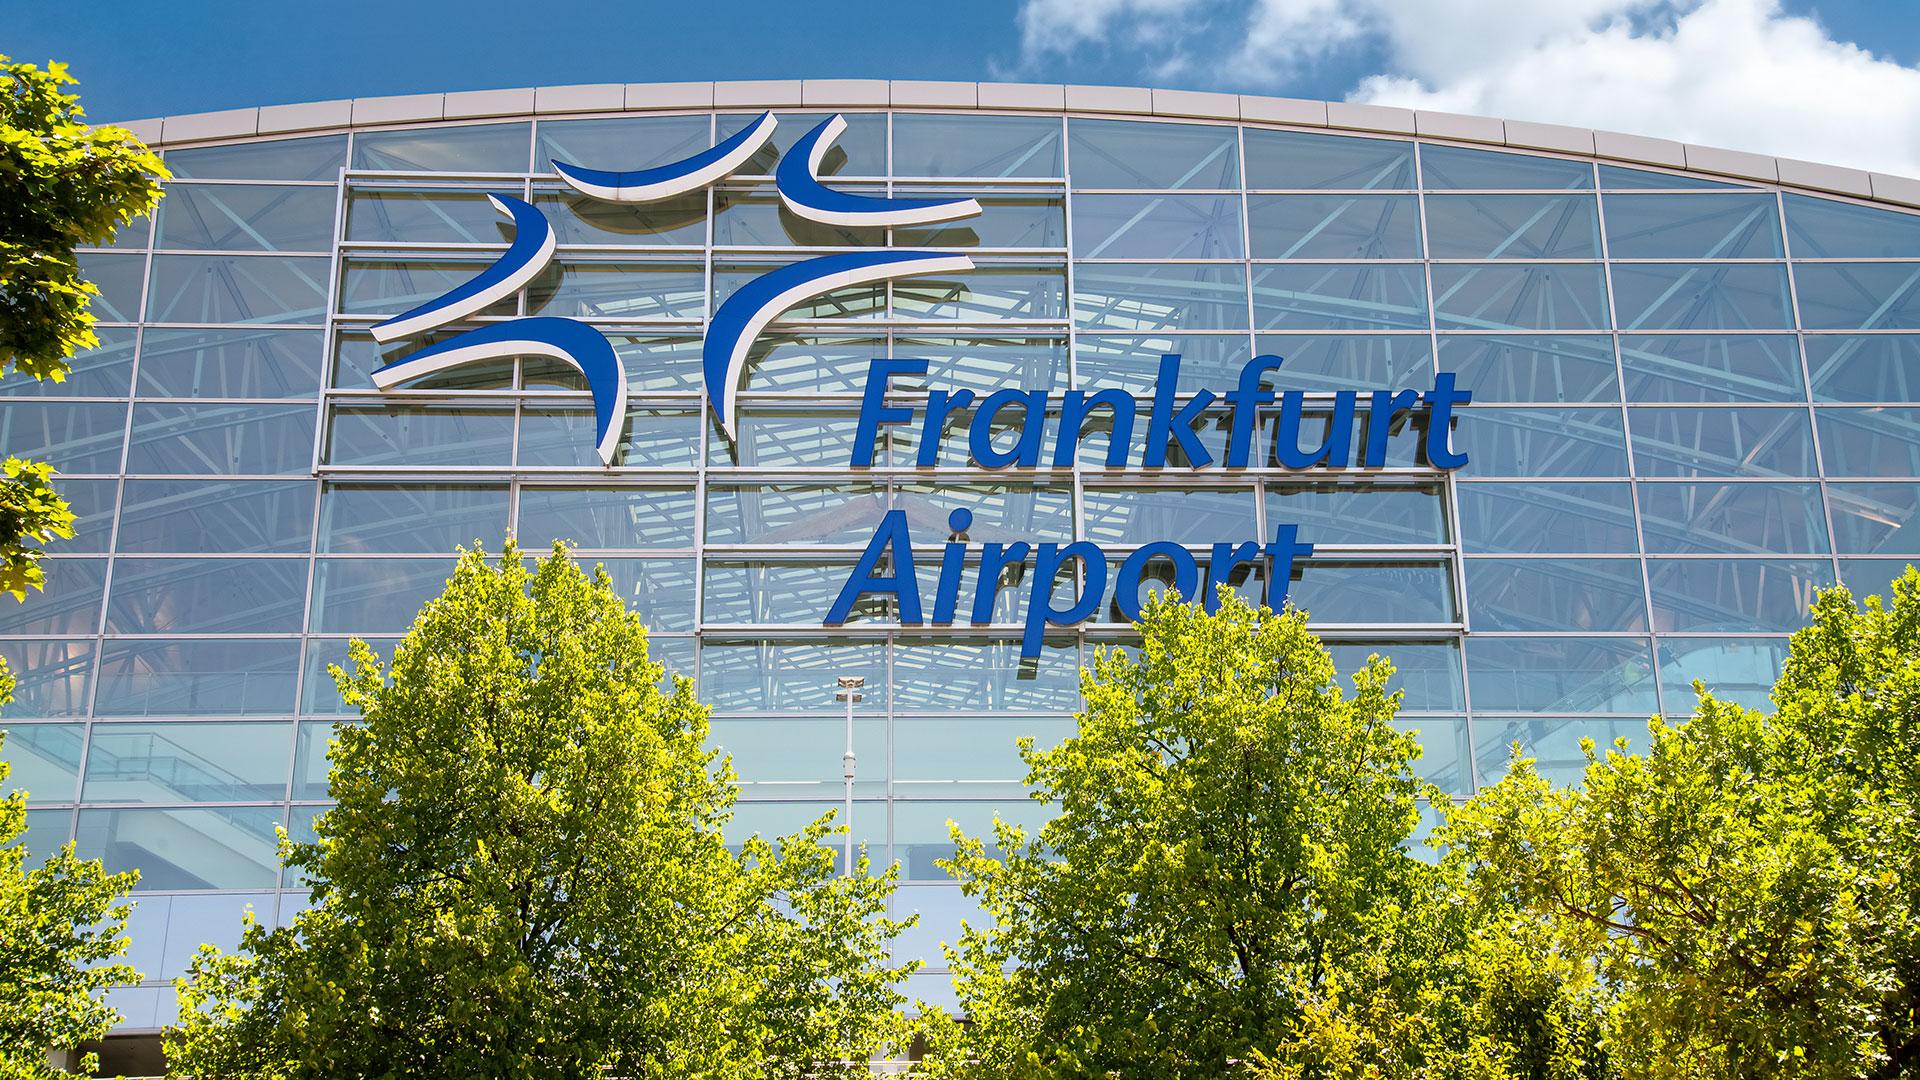 Frankfurter Flughafen 1